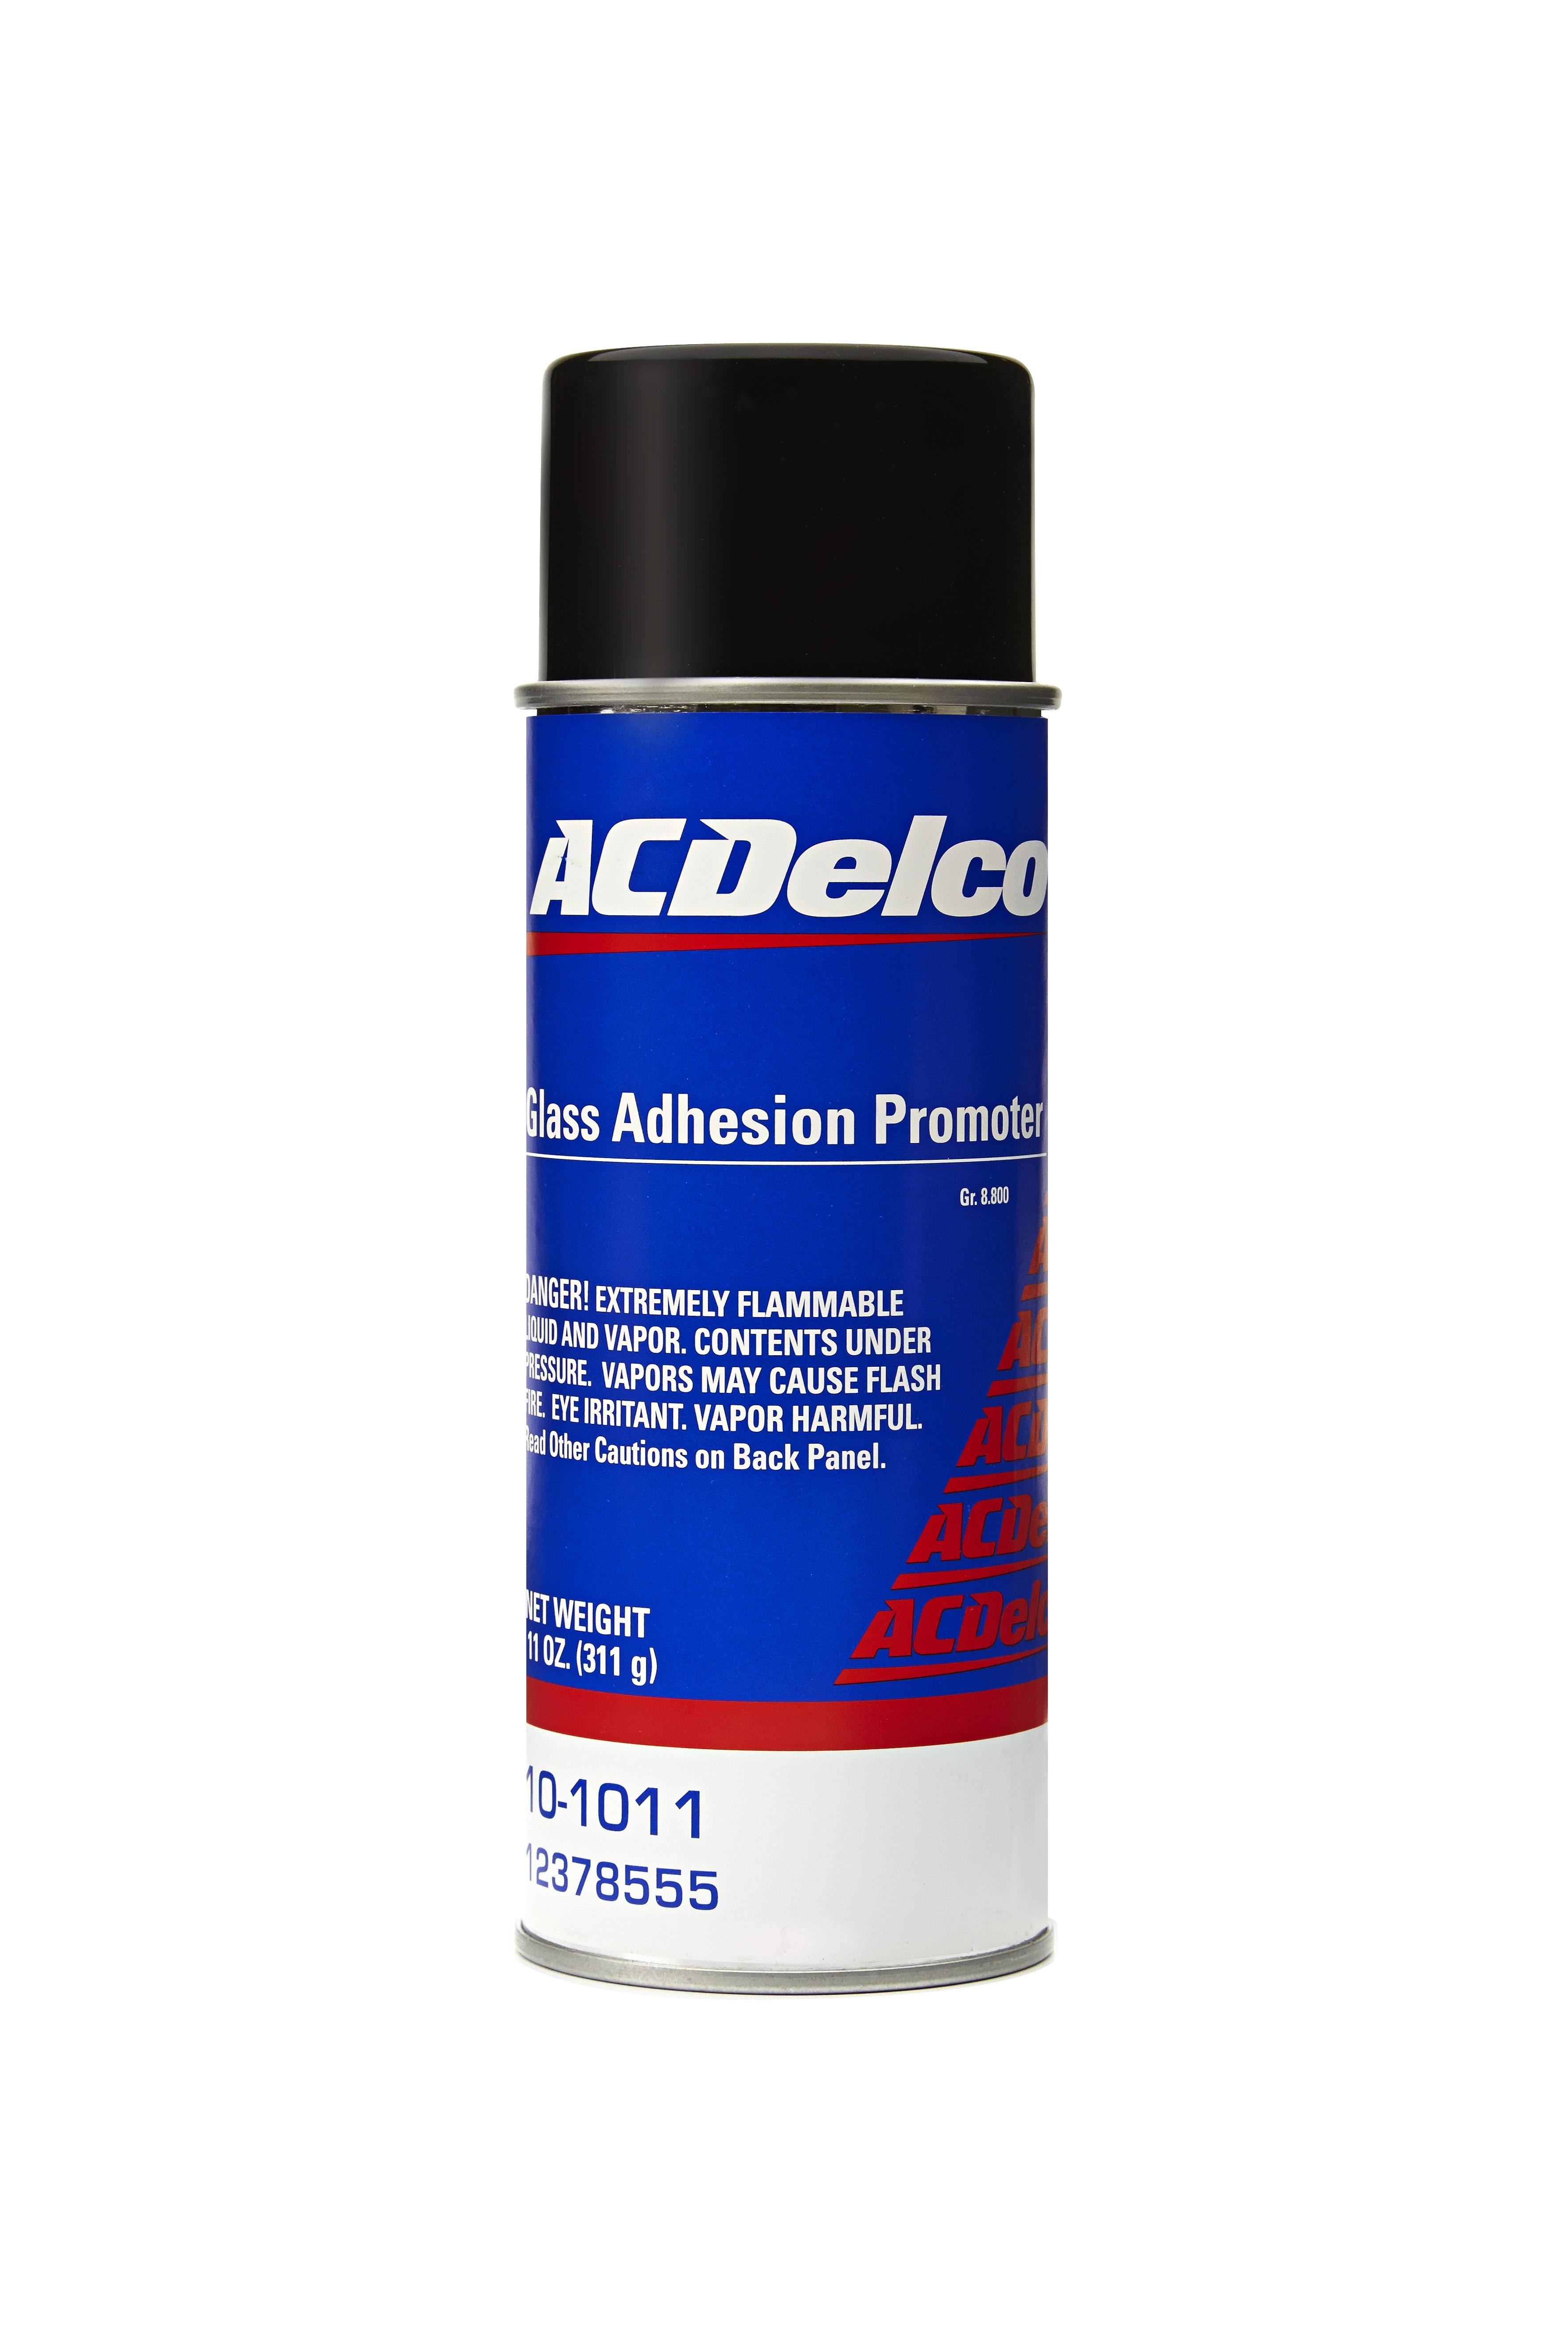 ACDELCO GM ORIGINAL EQUIPMENT - Adhesion Promoter - DCB 10-1011